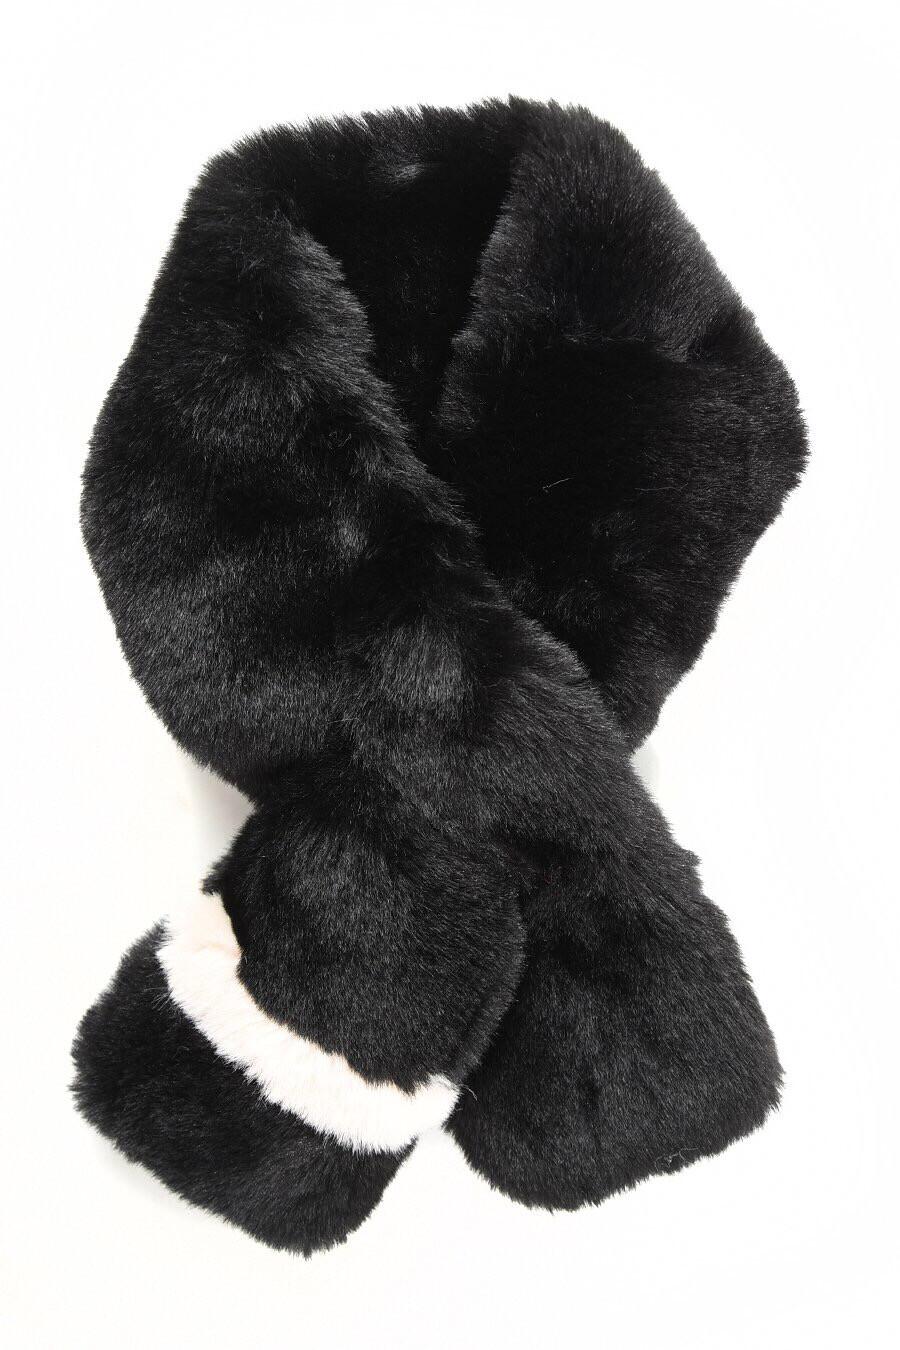 Black Faux Fur With Stripe